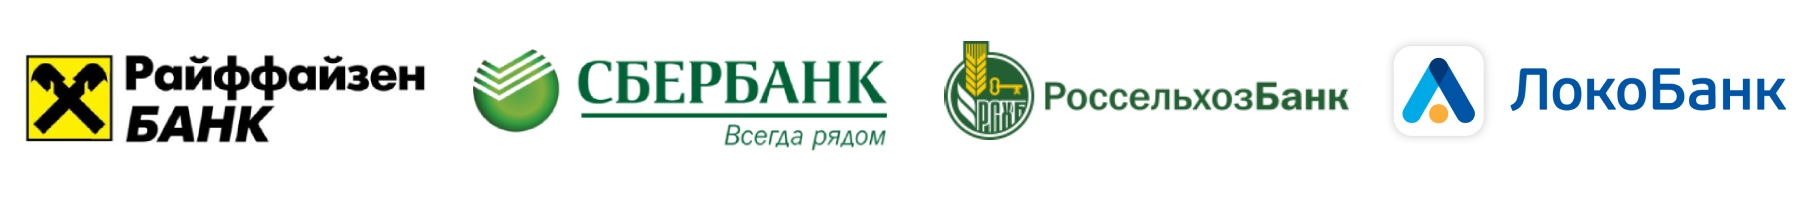 Банк партнёры